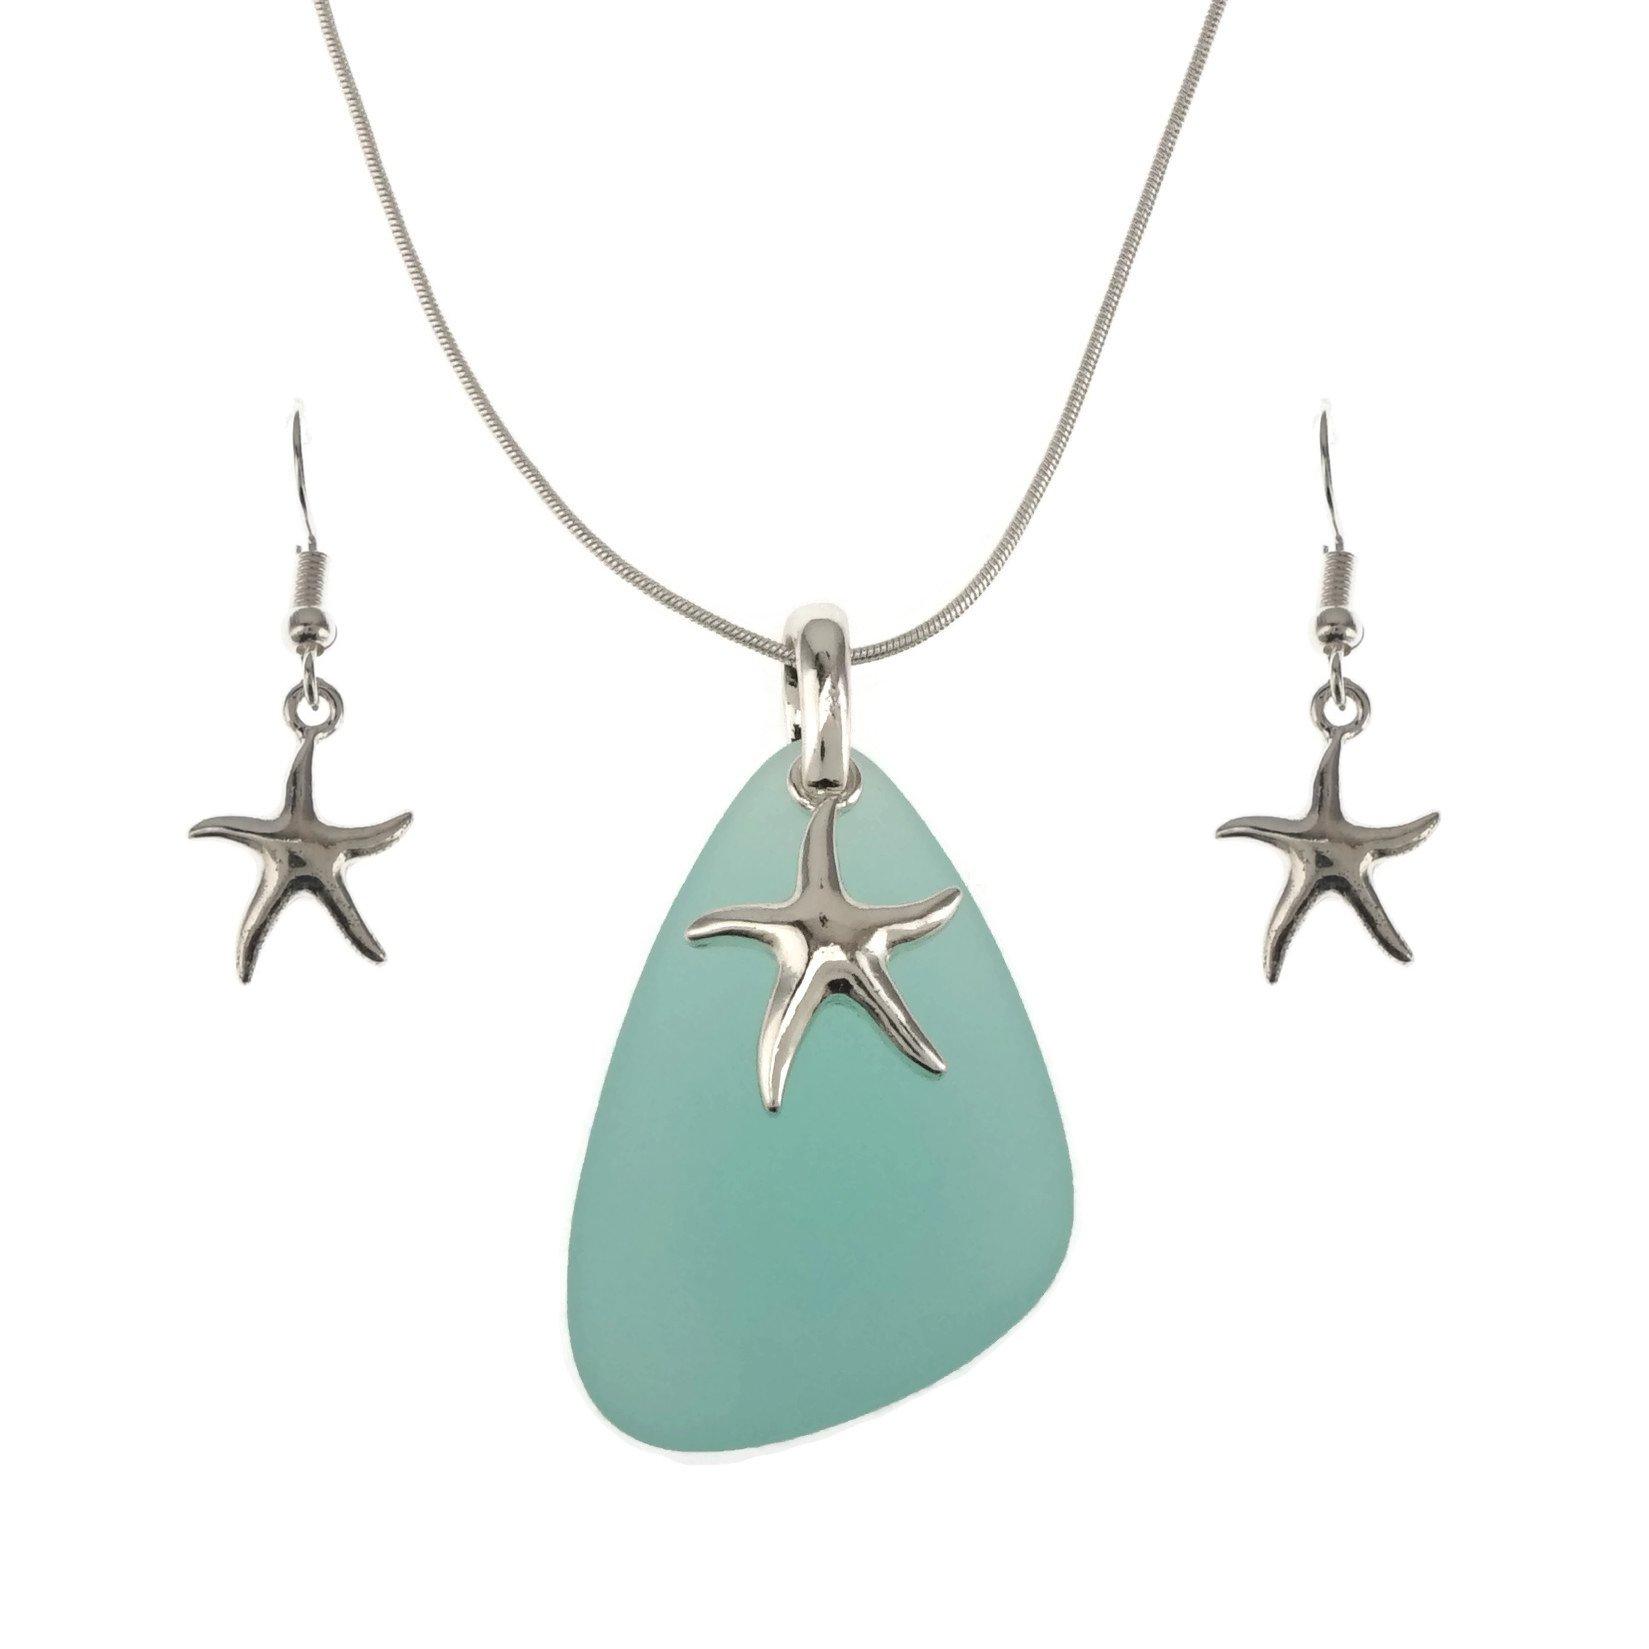 Jucicle Blue Sea Glass Pendant Long Necklace 27'' and Earrings Set (Starfish - Aqua)